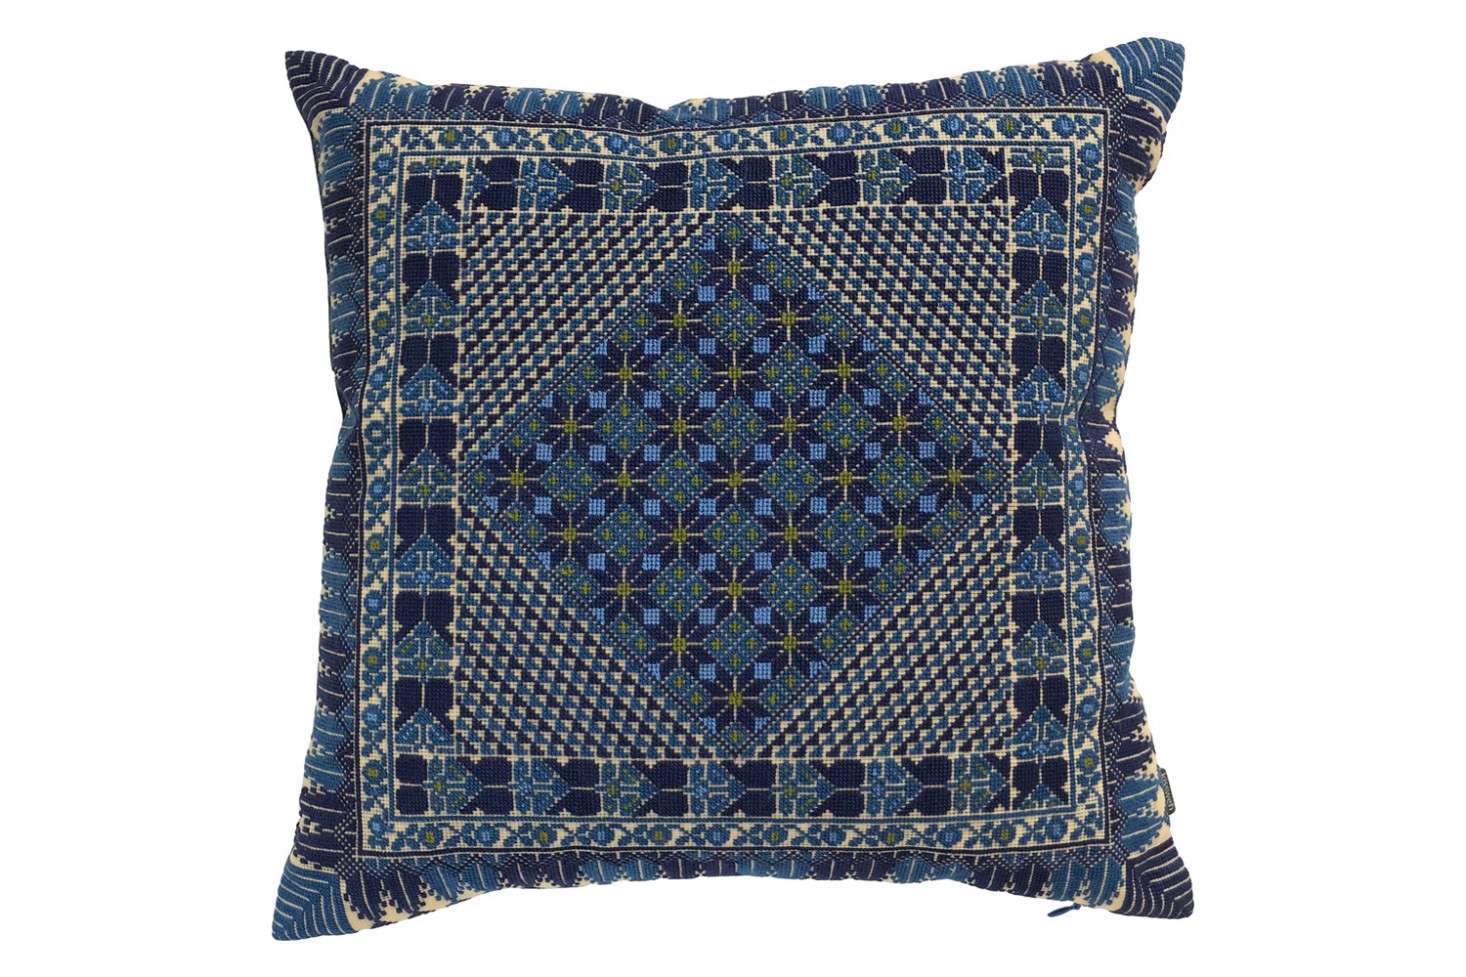 The Kissweh Classic Pillow has a navy blue Belgian linen back; 350.